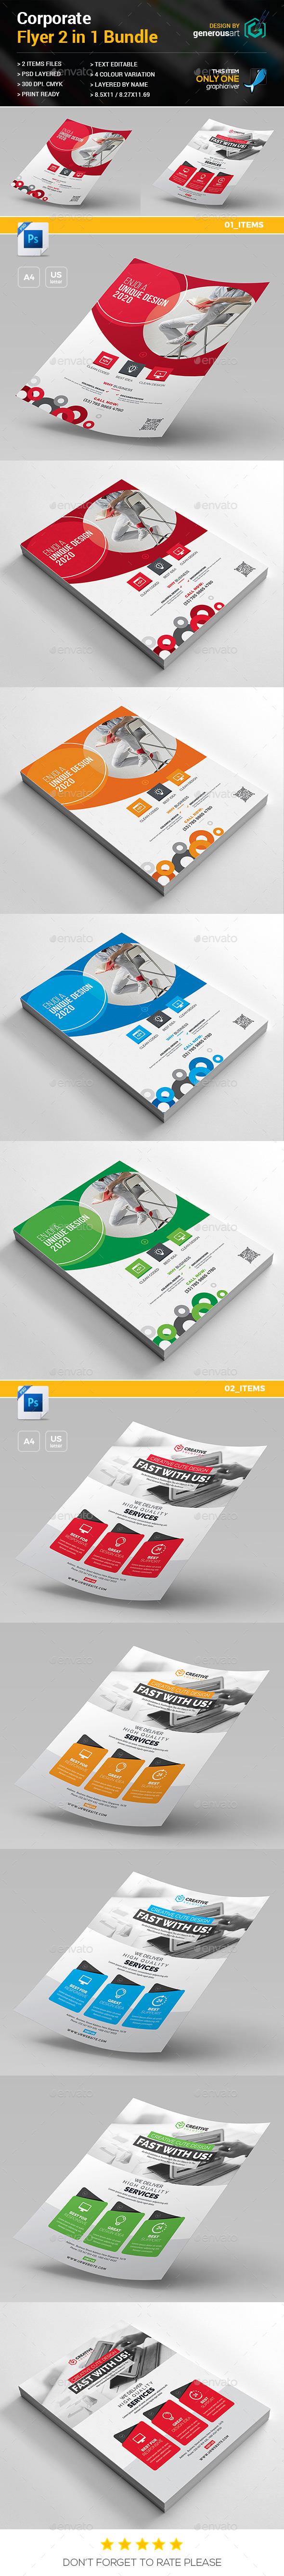 Flyer Bundle 2 in 1 - Corporate Flyers